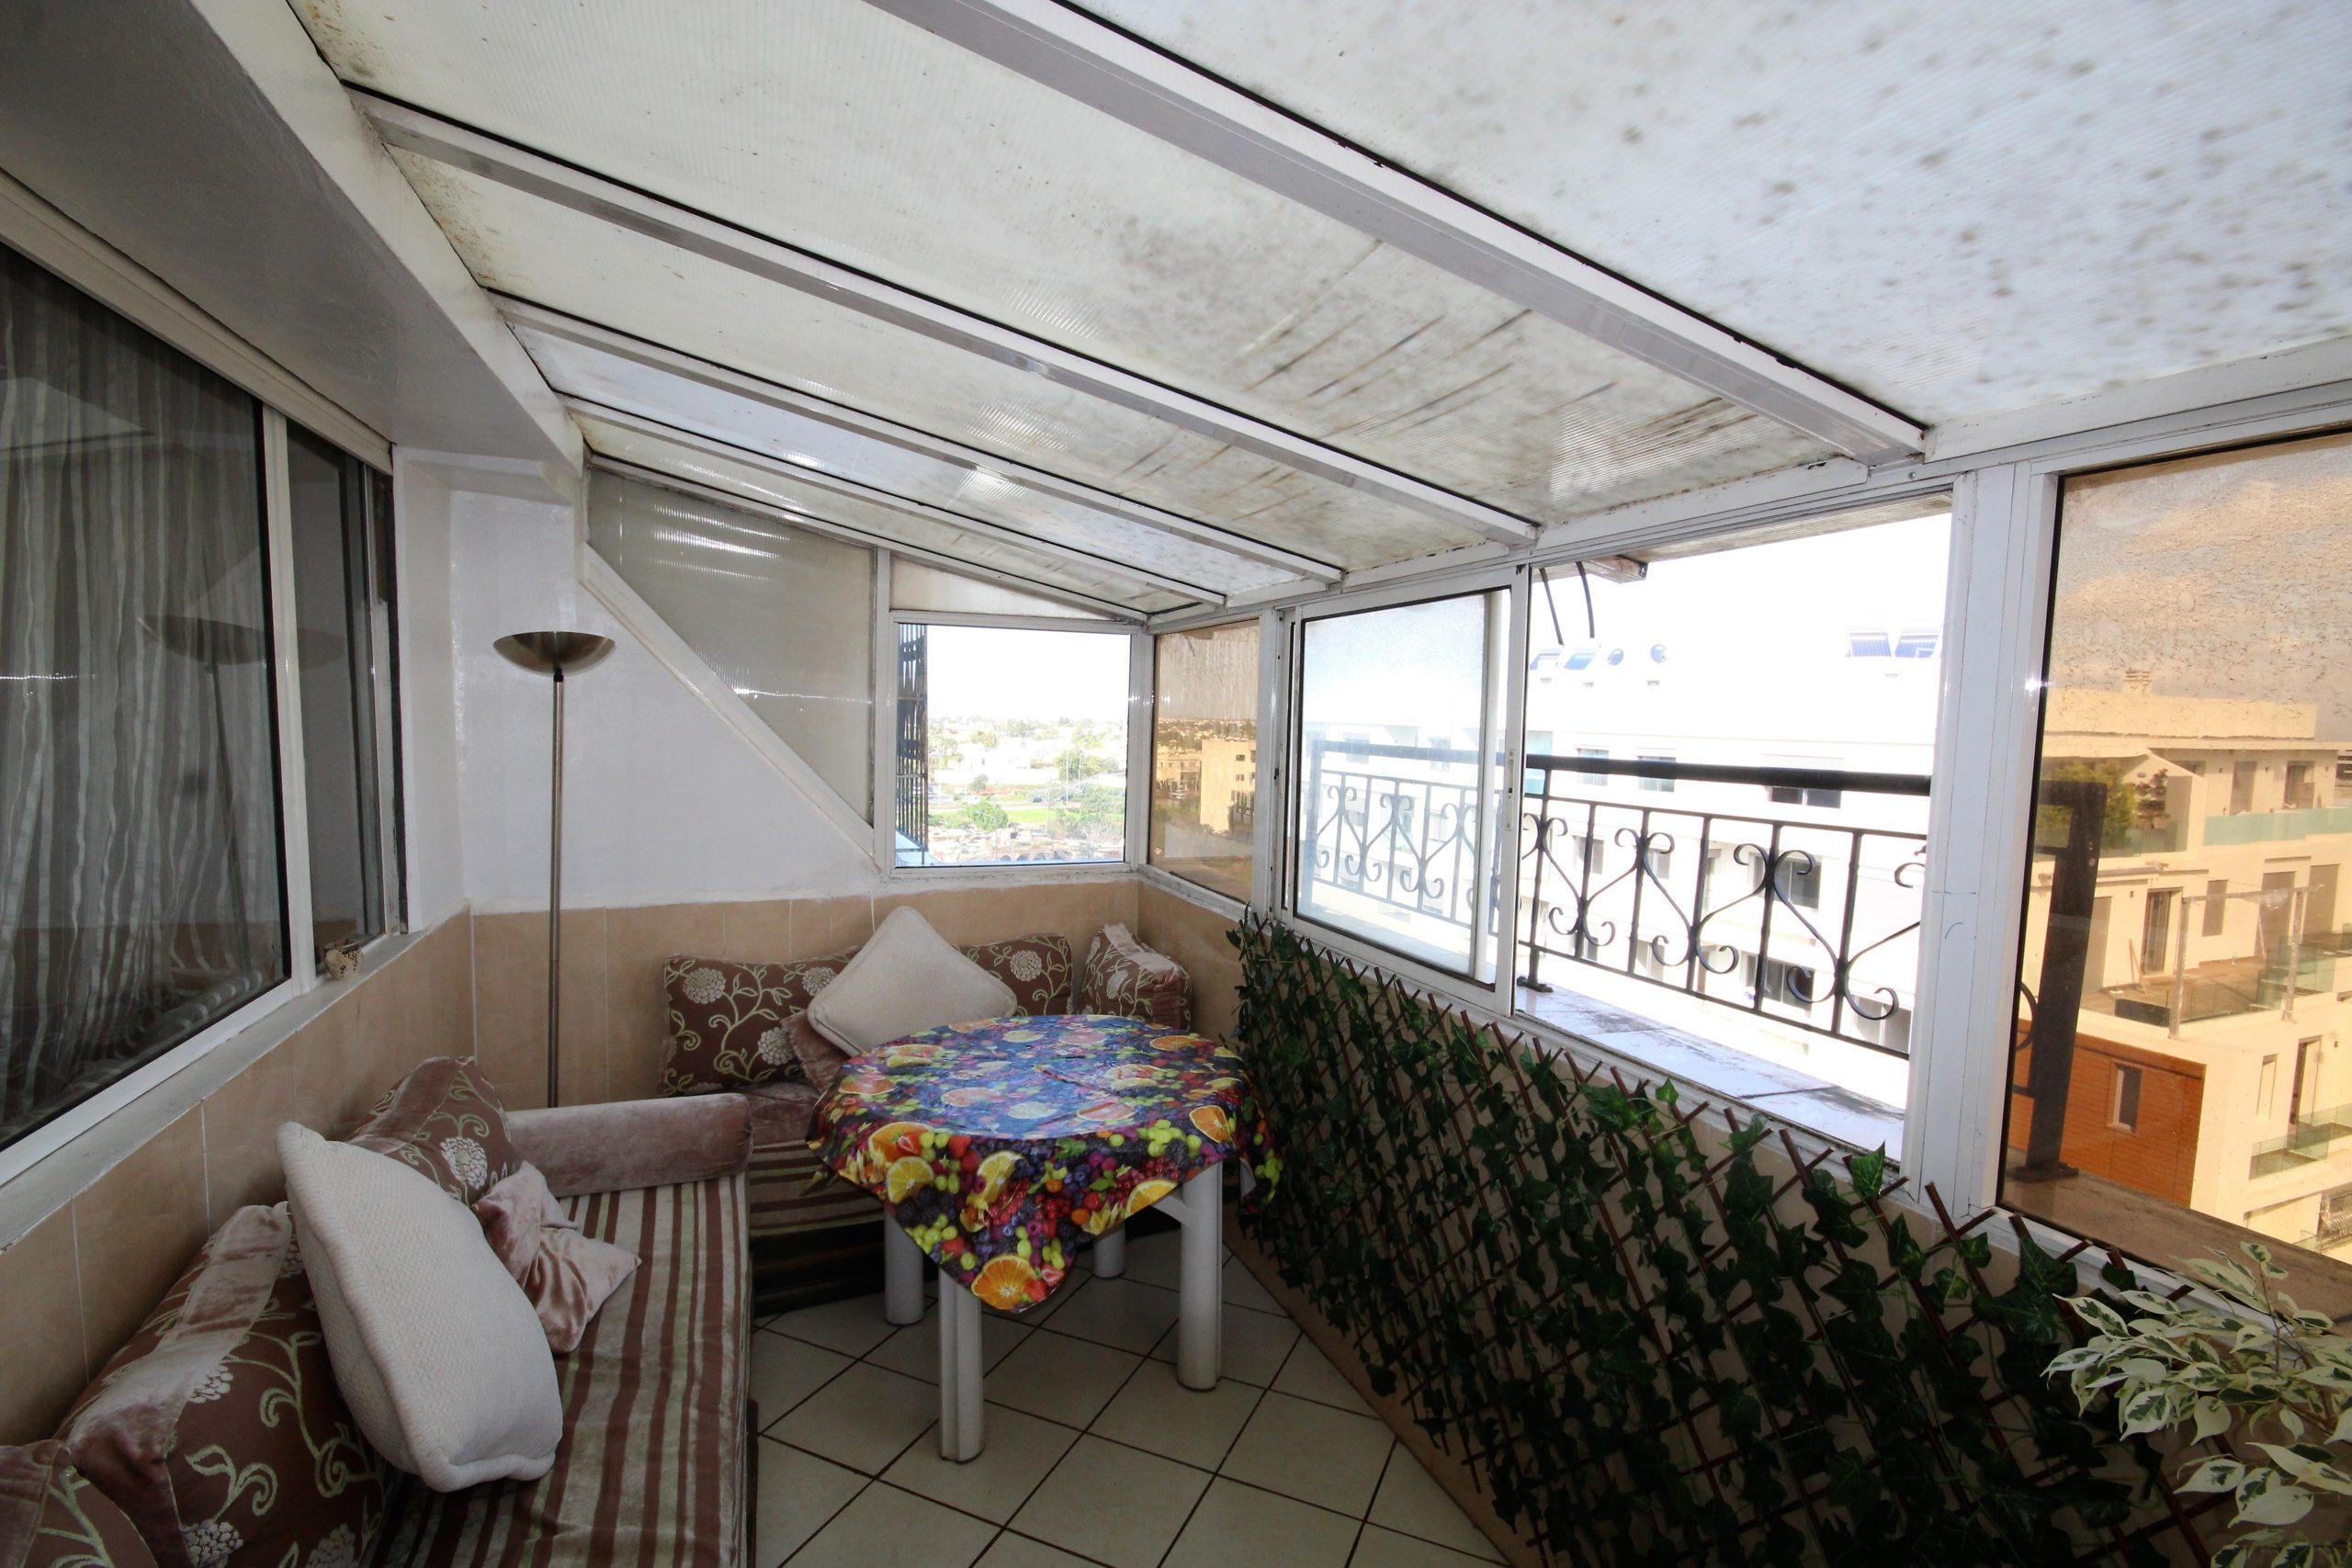 Maroc, Casablanca, Californie, vend 5 pièces avec grande terrasse bon prix